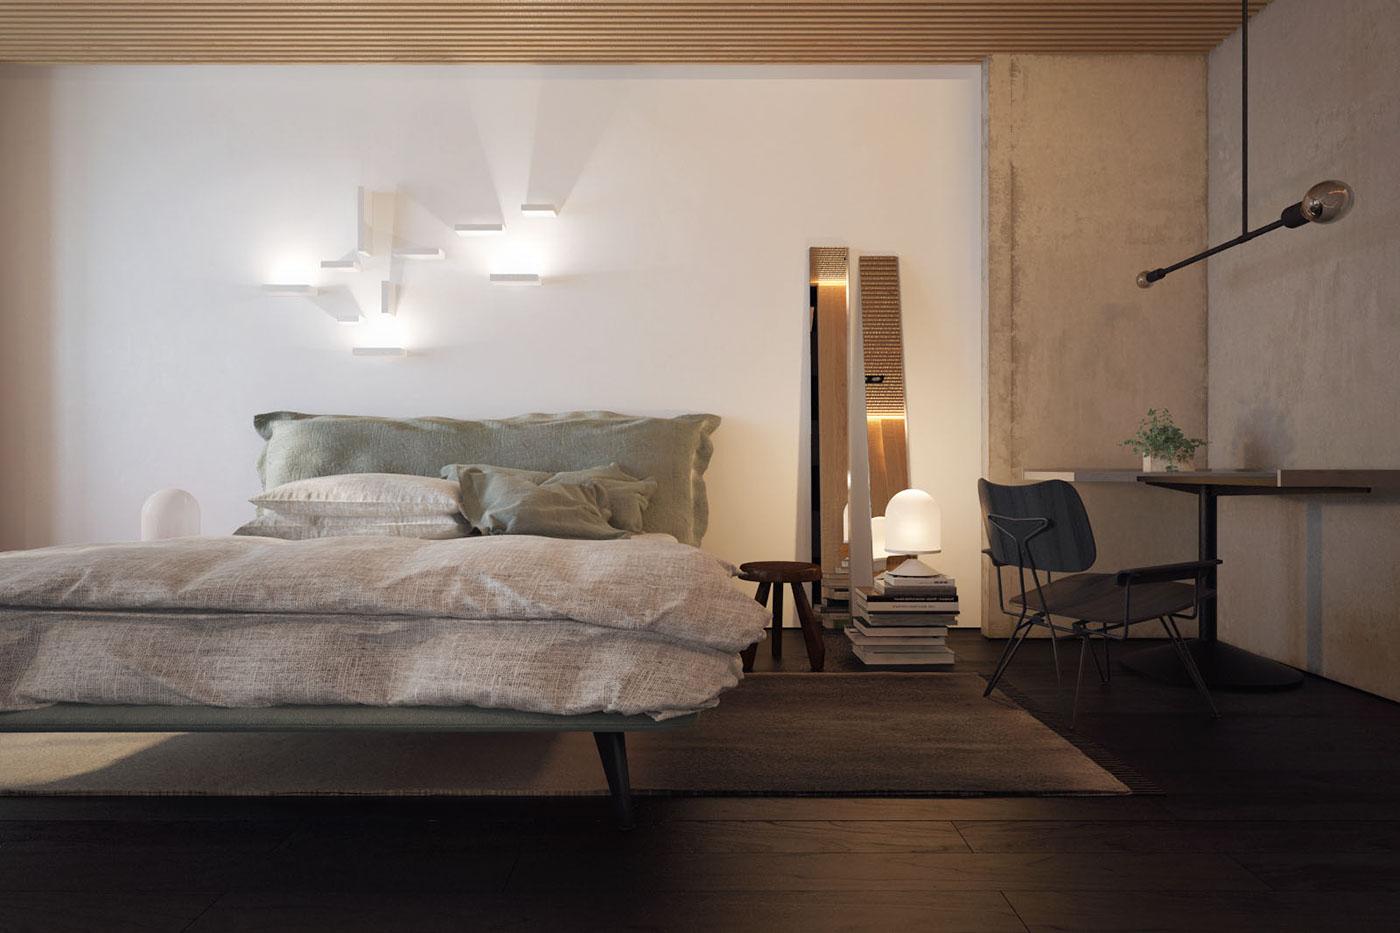 teal-duvet-bar-lights-inspired-bedroom